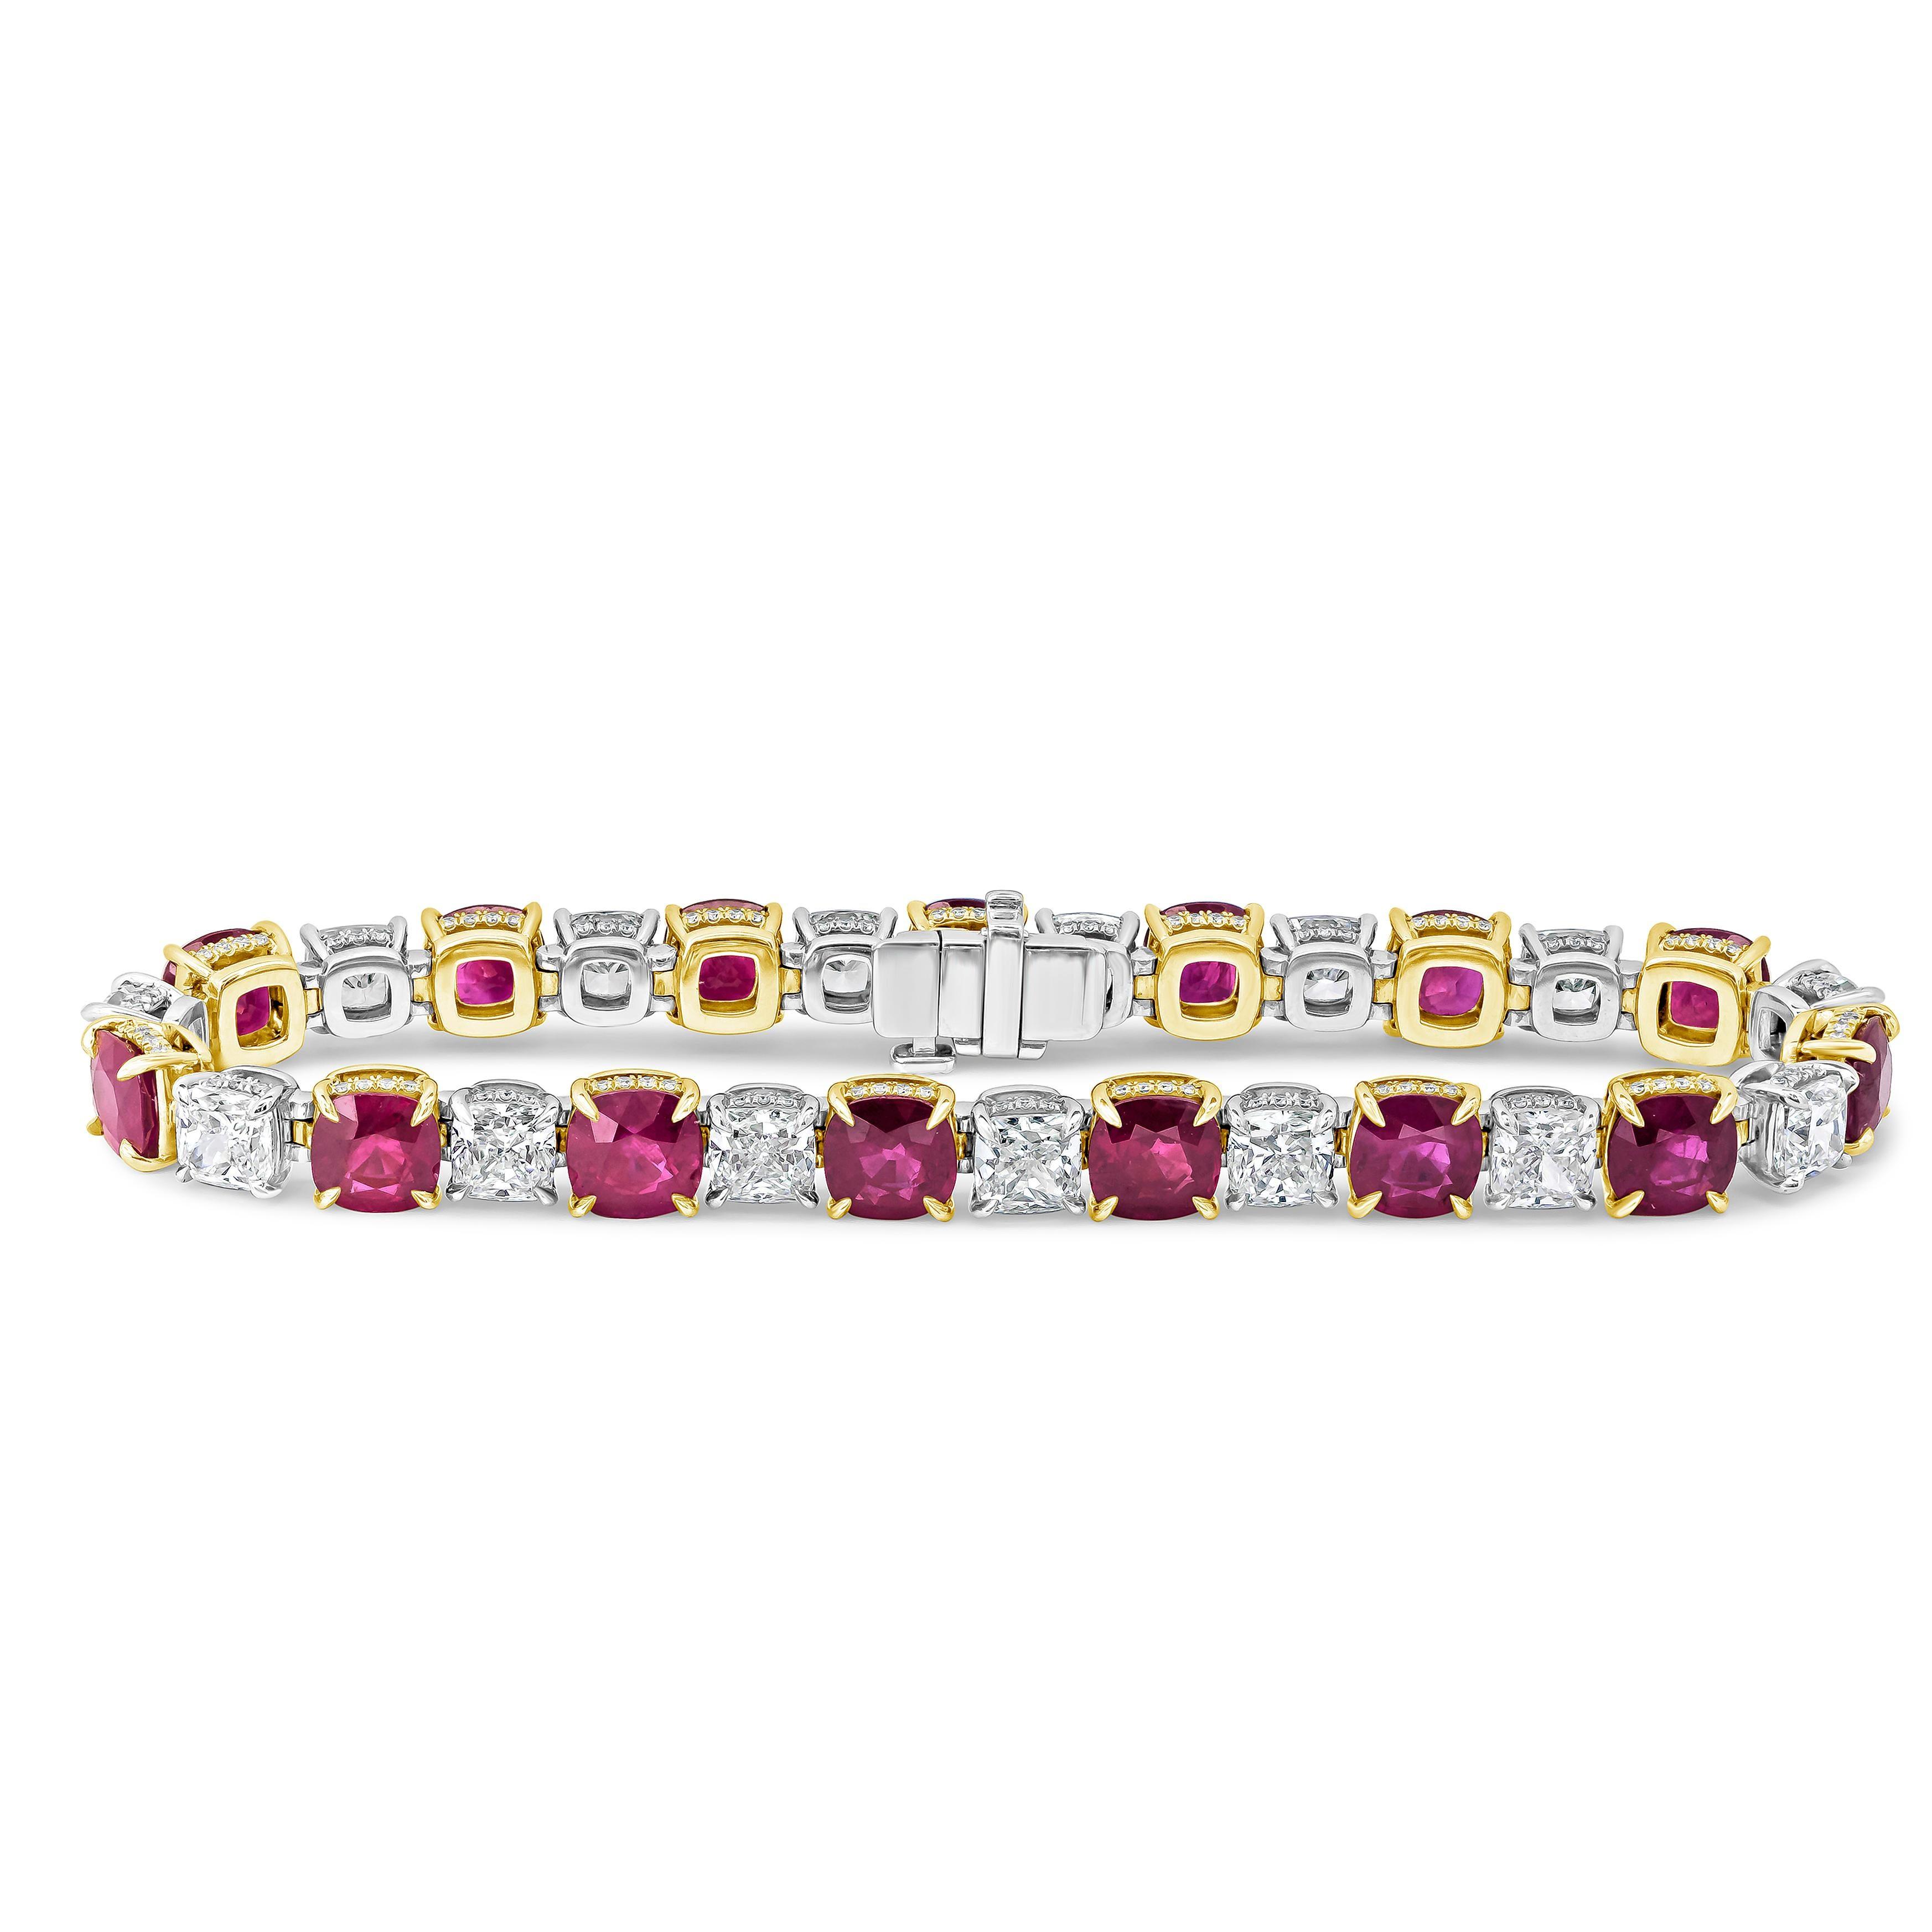 Roman Malakov Alternating Cushion Cut Burmese Ruby and Diamond Tennis Bracelet